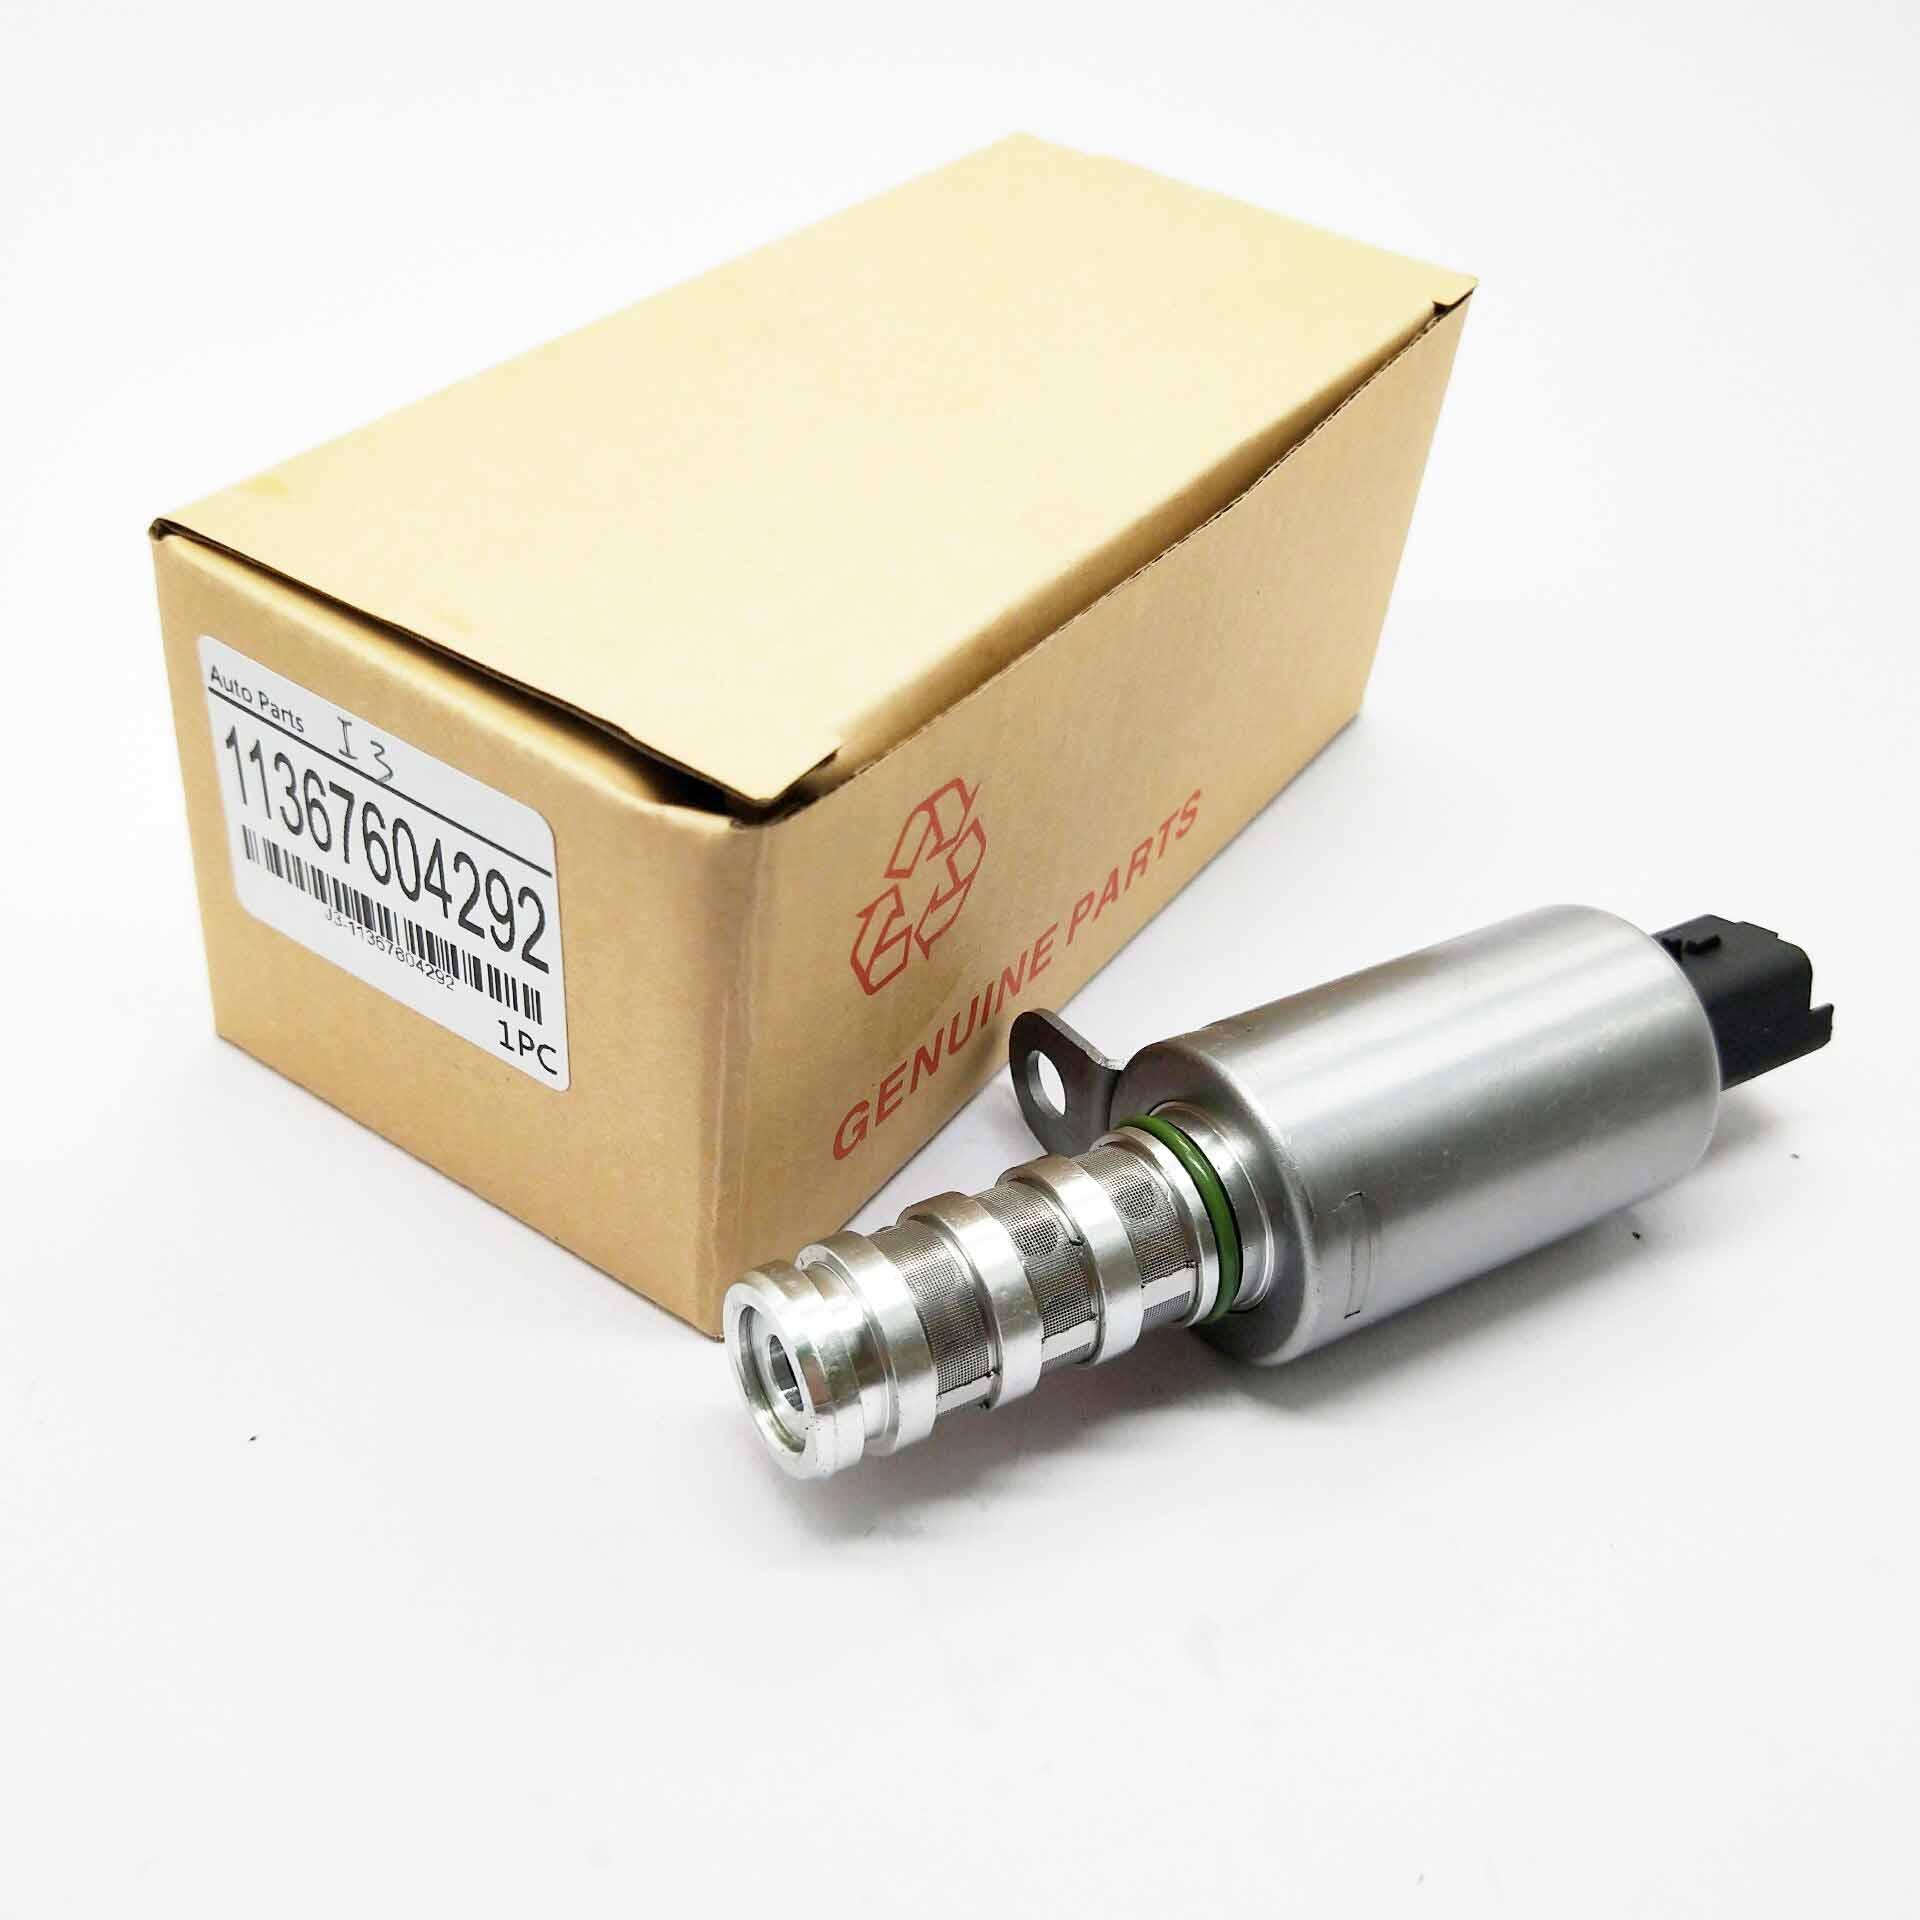 11367604292 Variable Valve Timing Control Solenoid Vanos For Citroen Peugeot 1 6 THP V758776080 11367587760 11368610388